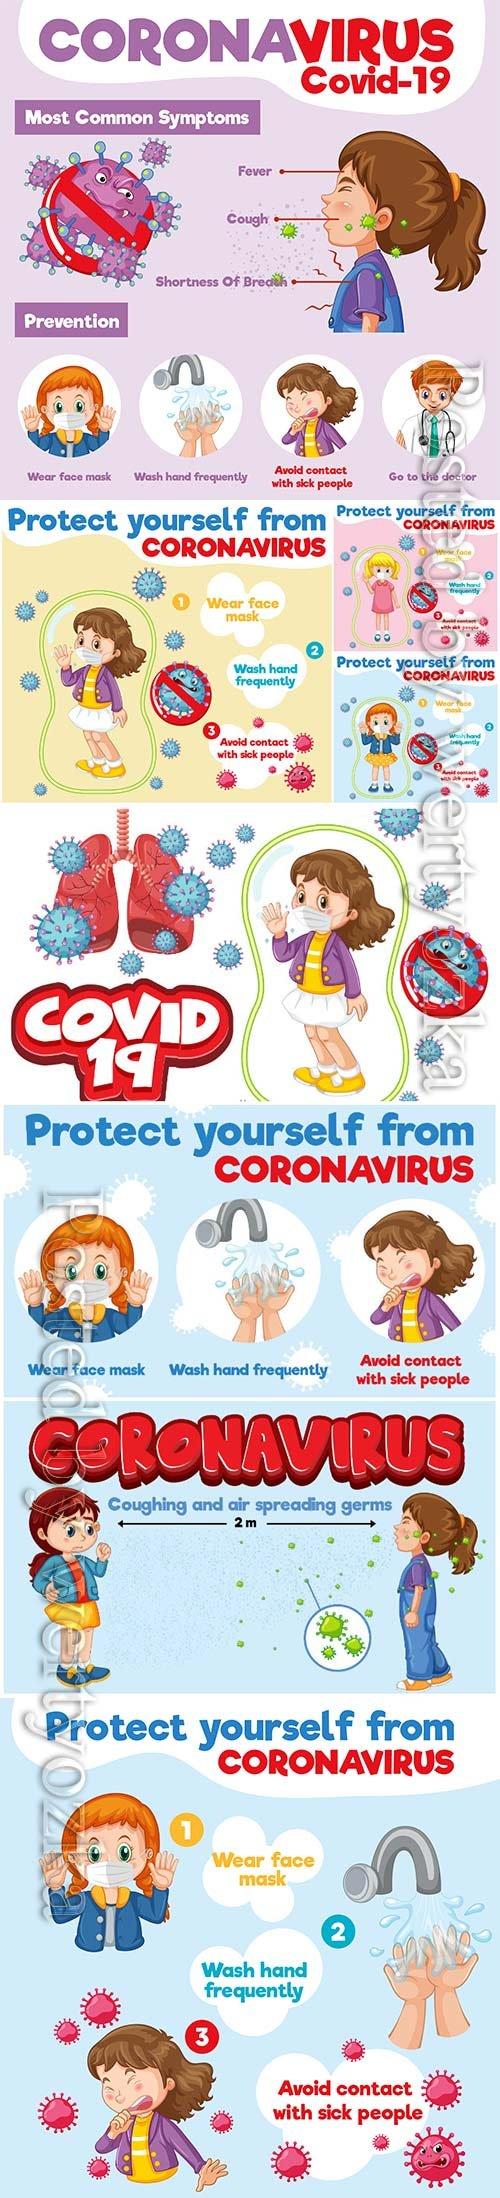 Coronavirus, medicine and people concept vector # 8